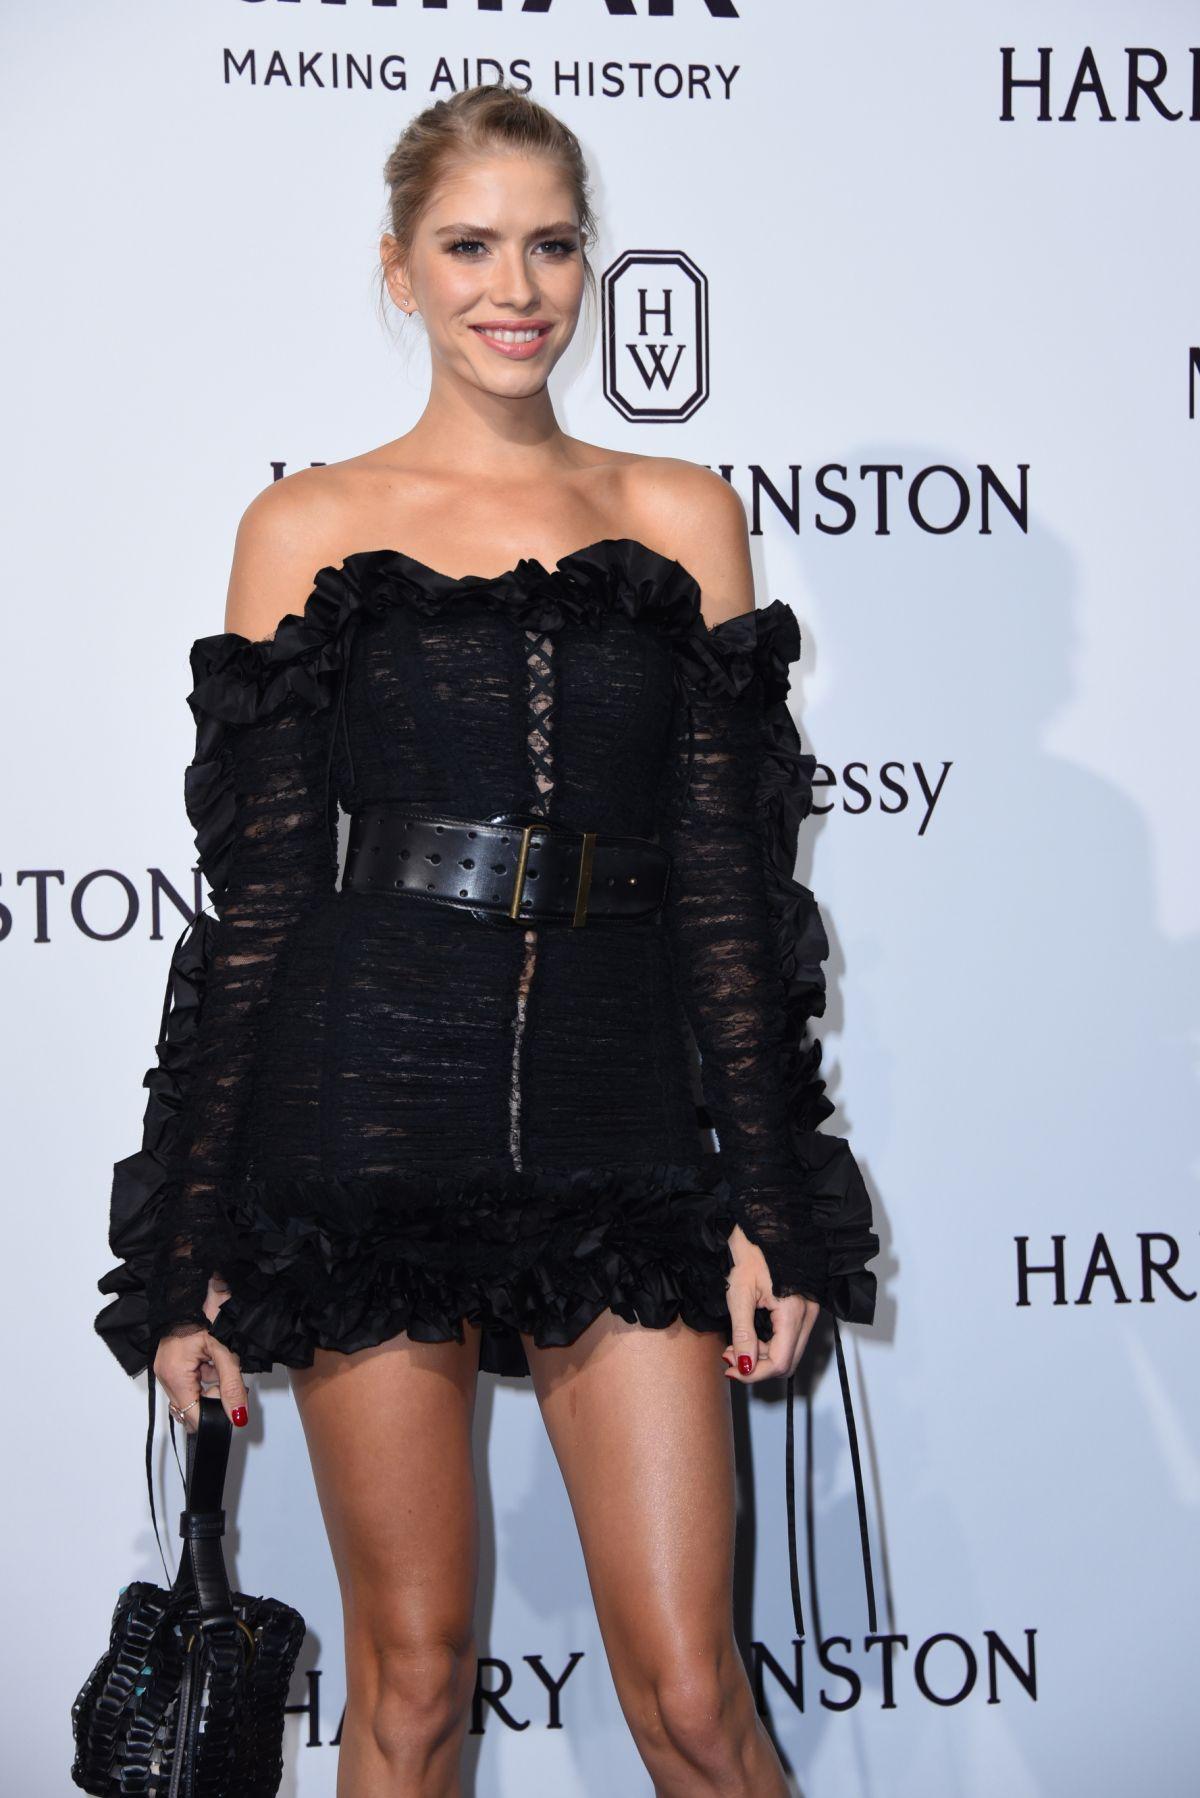 ELENA PERMINOVA at amfAR Gala in Milan 09/26/2015